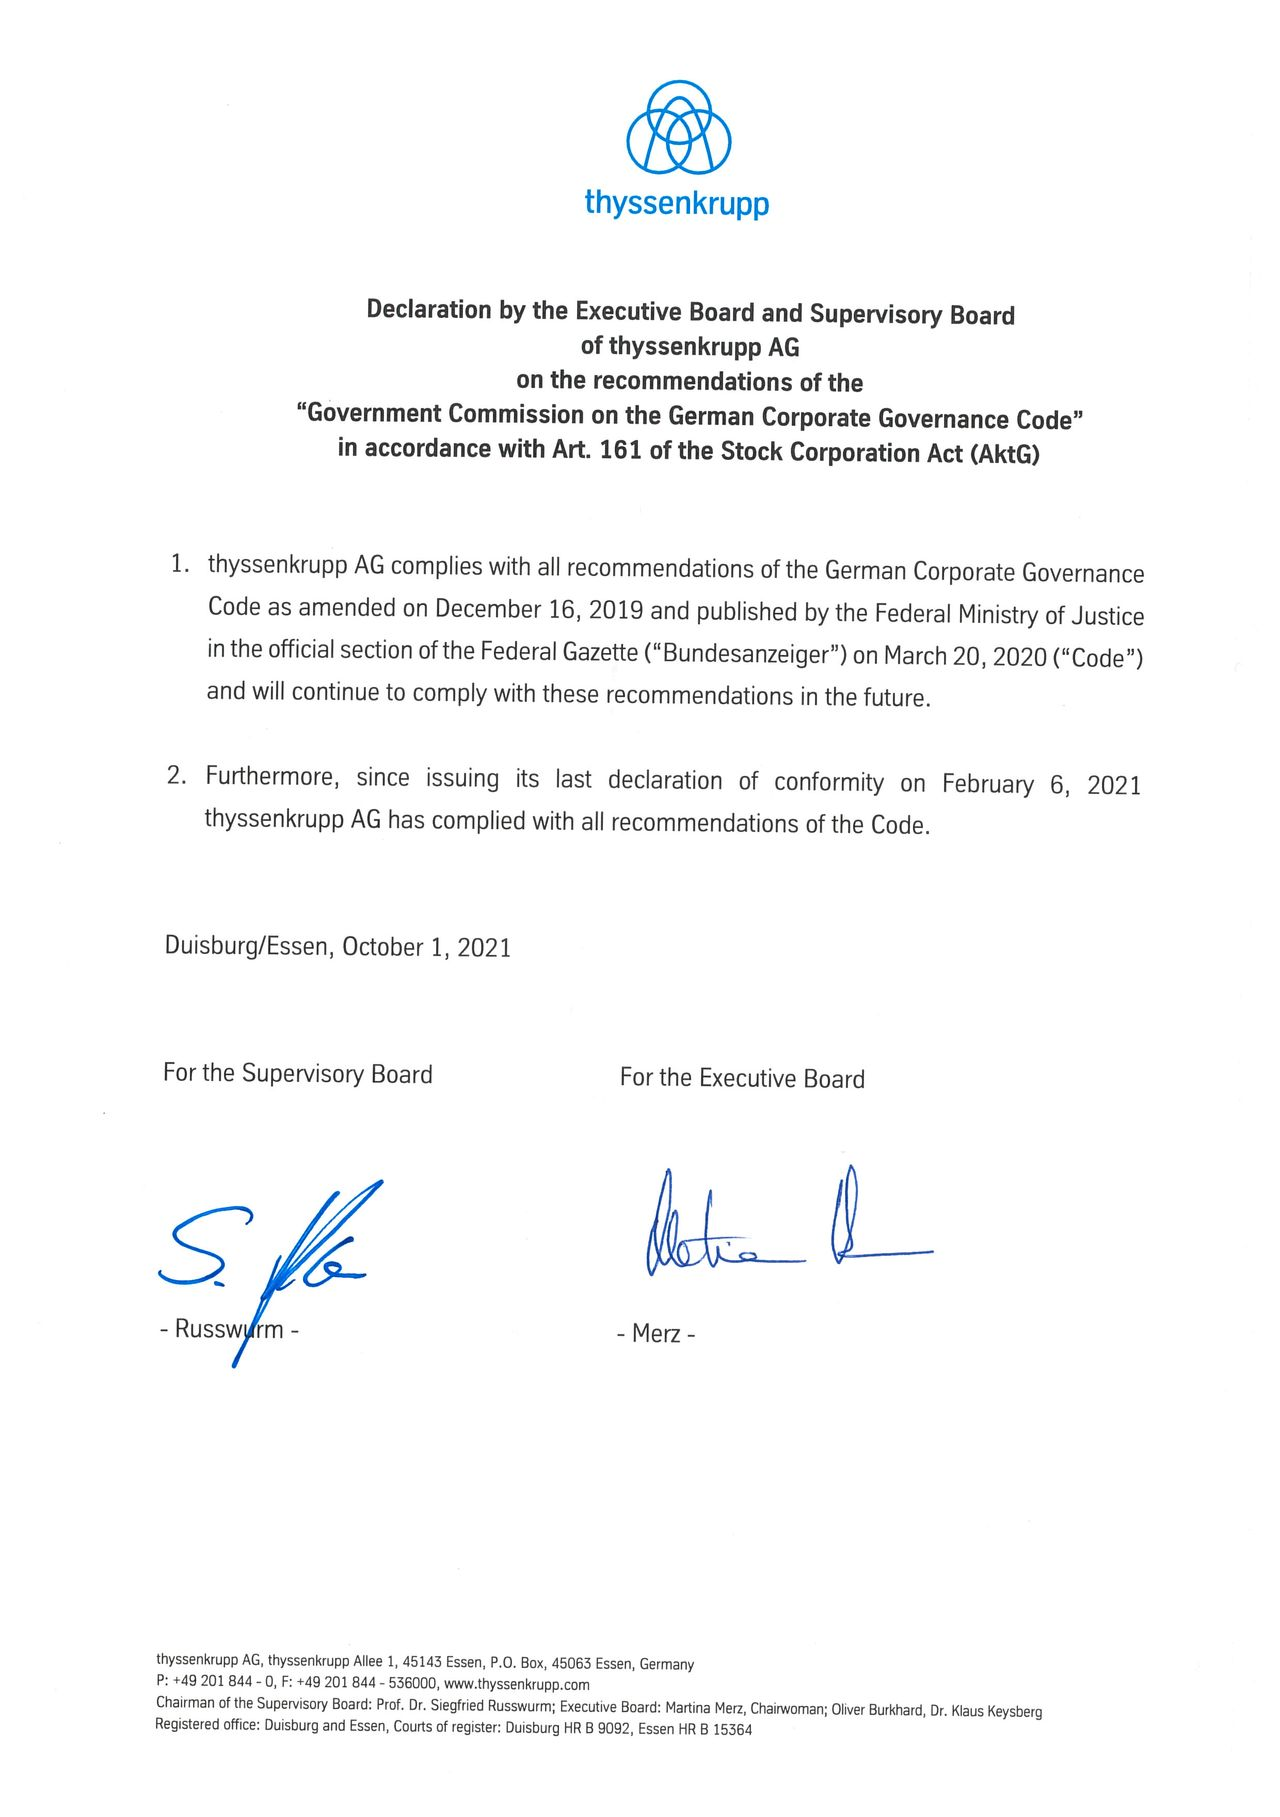 Declaration of conformity thyssenkrupp as of October 1, 2021